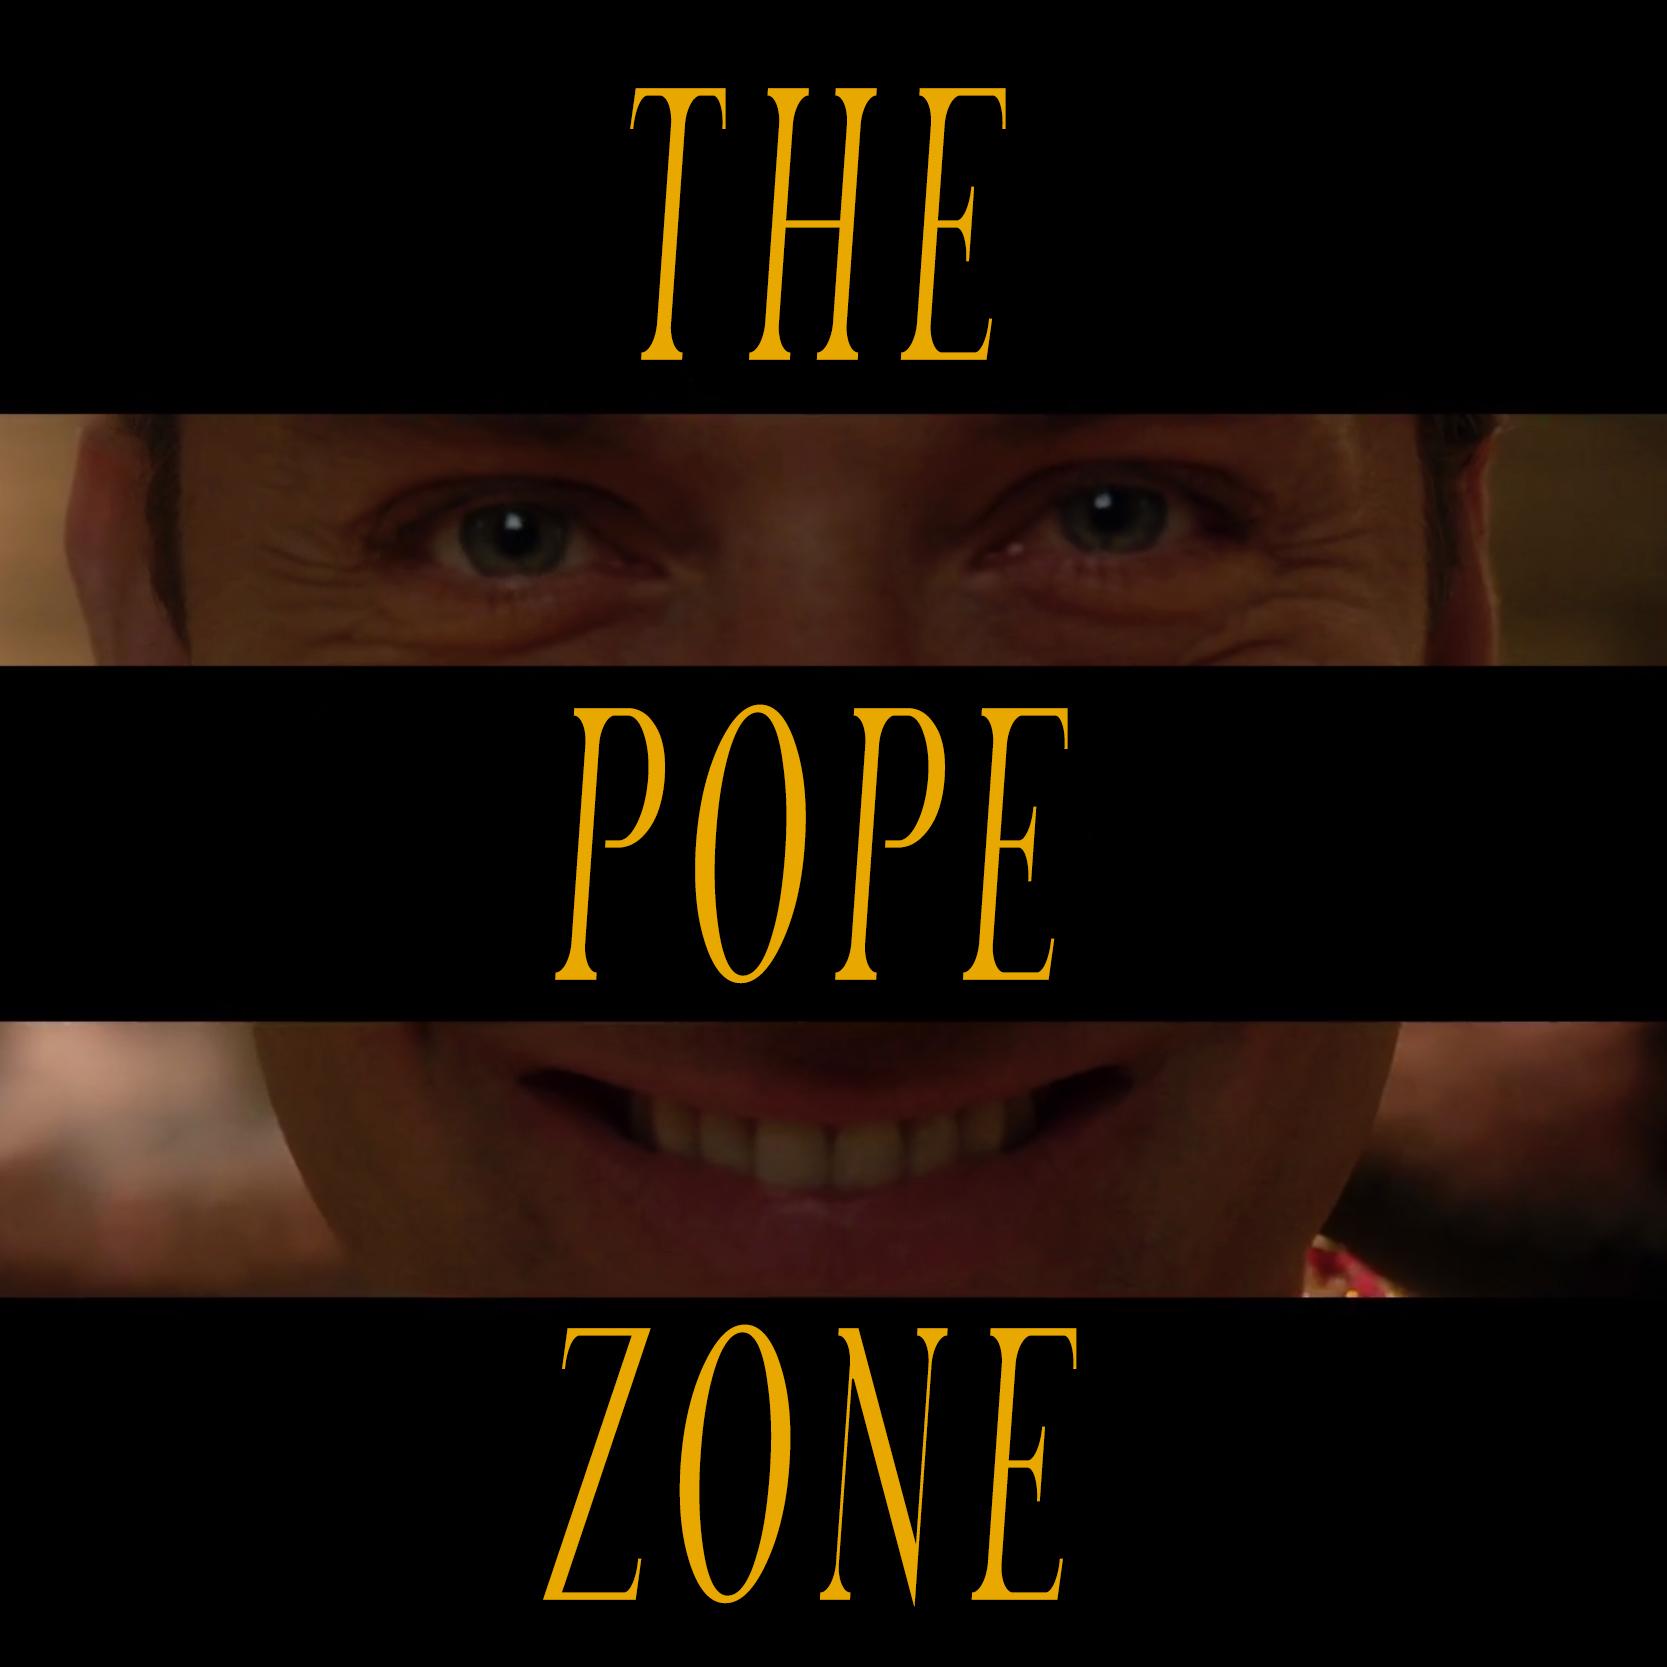 pope-zone (1)